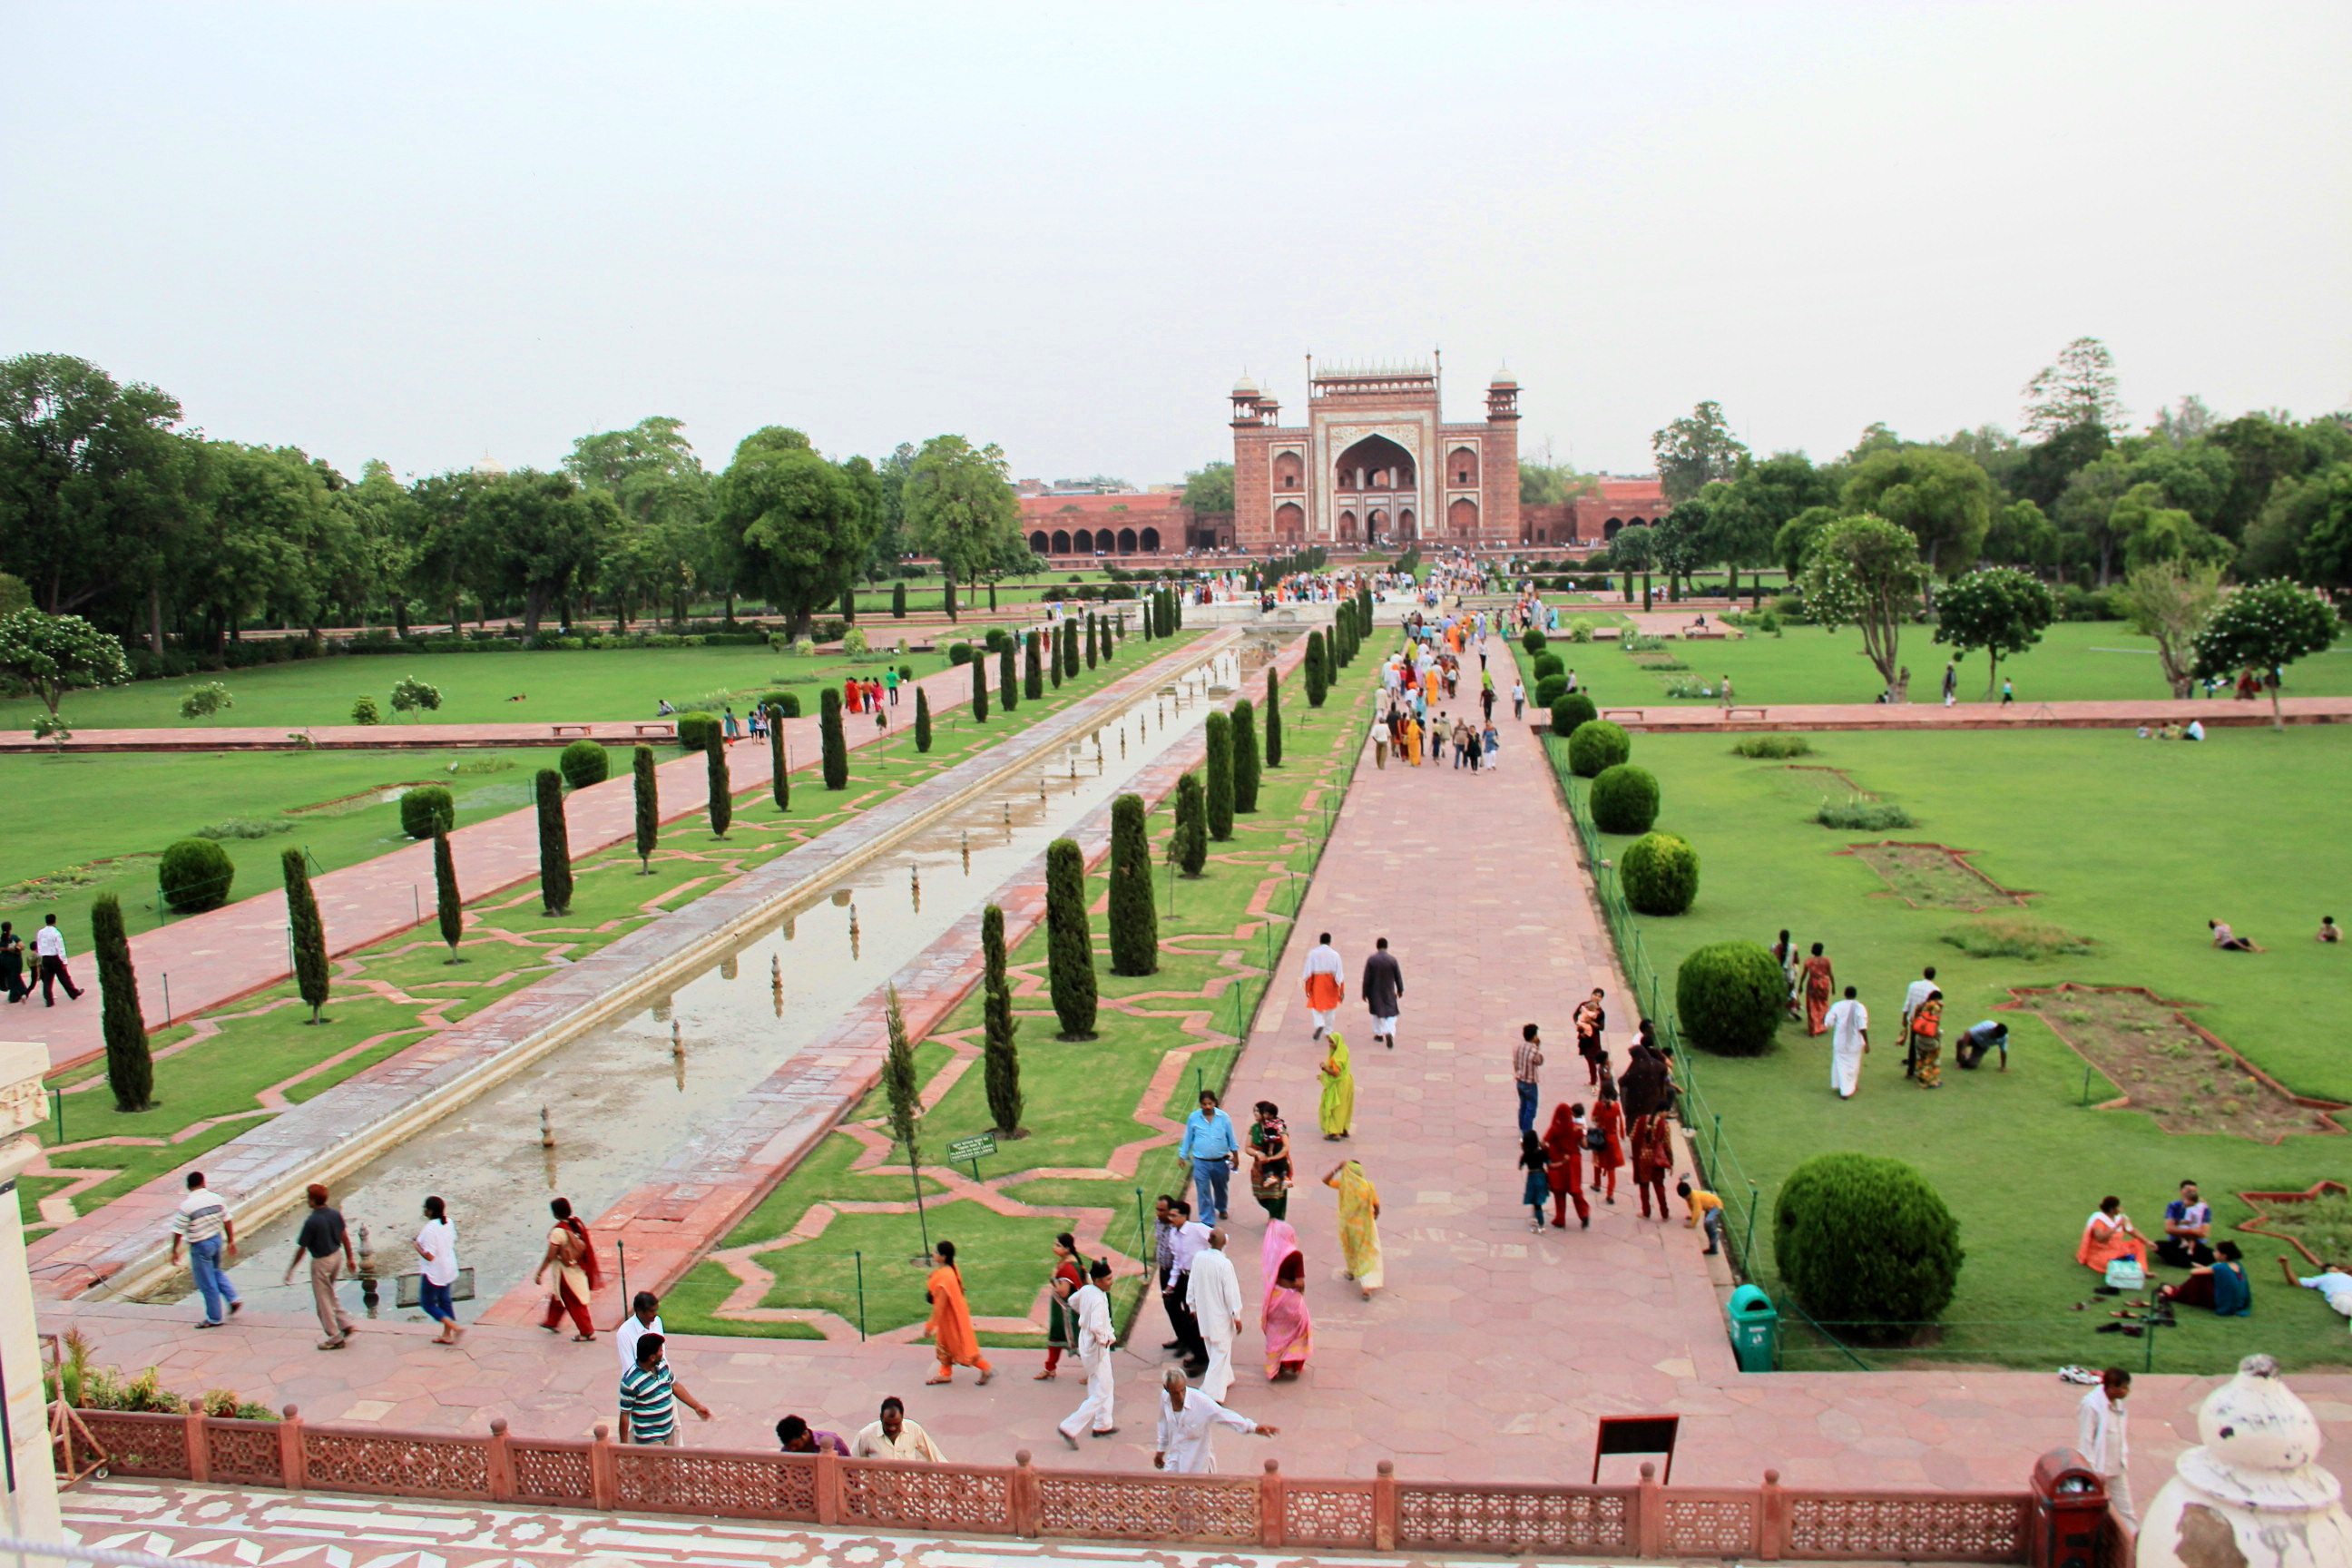 View of Garden from Taj Mahal, Agra, India